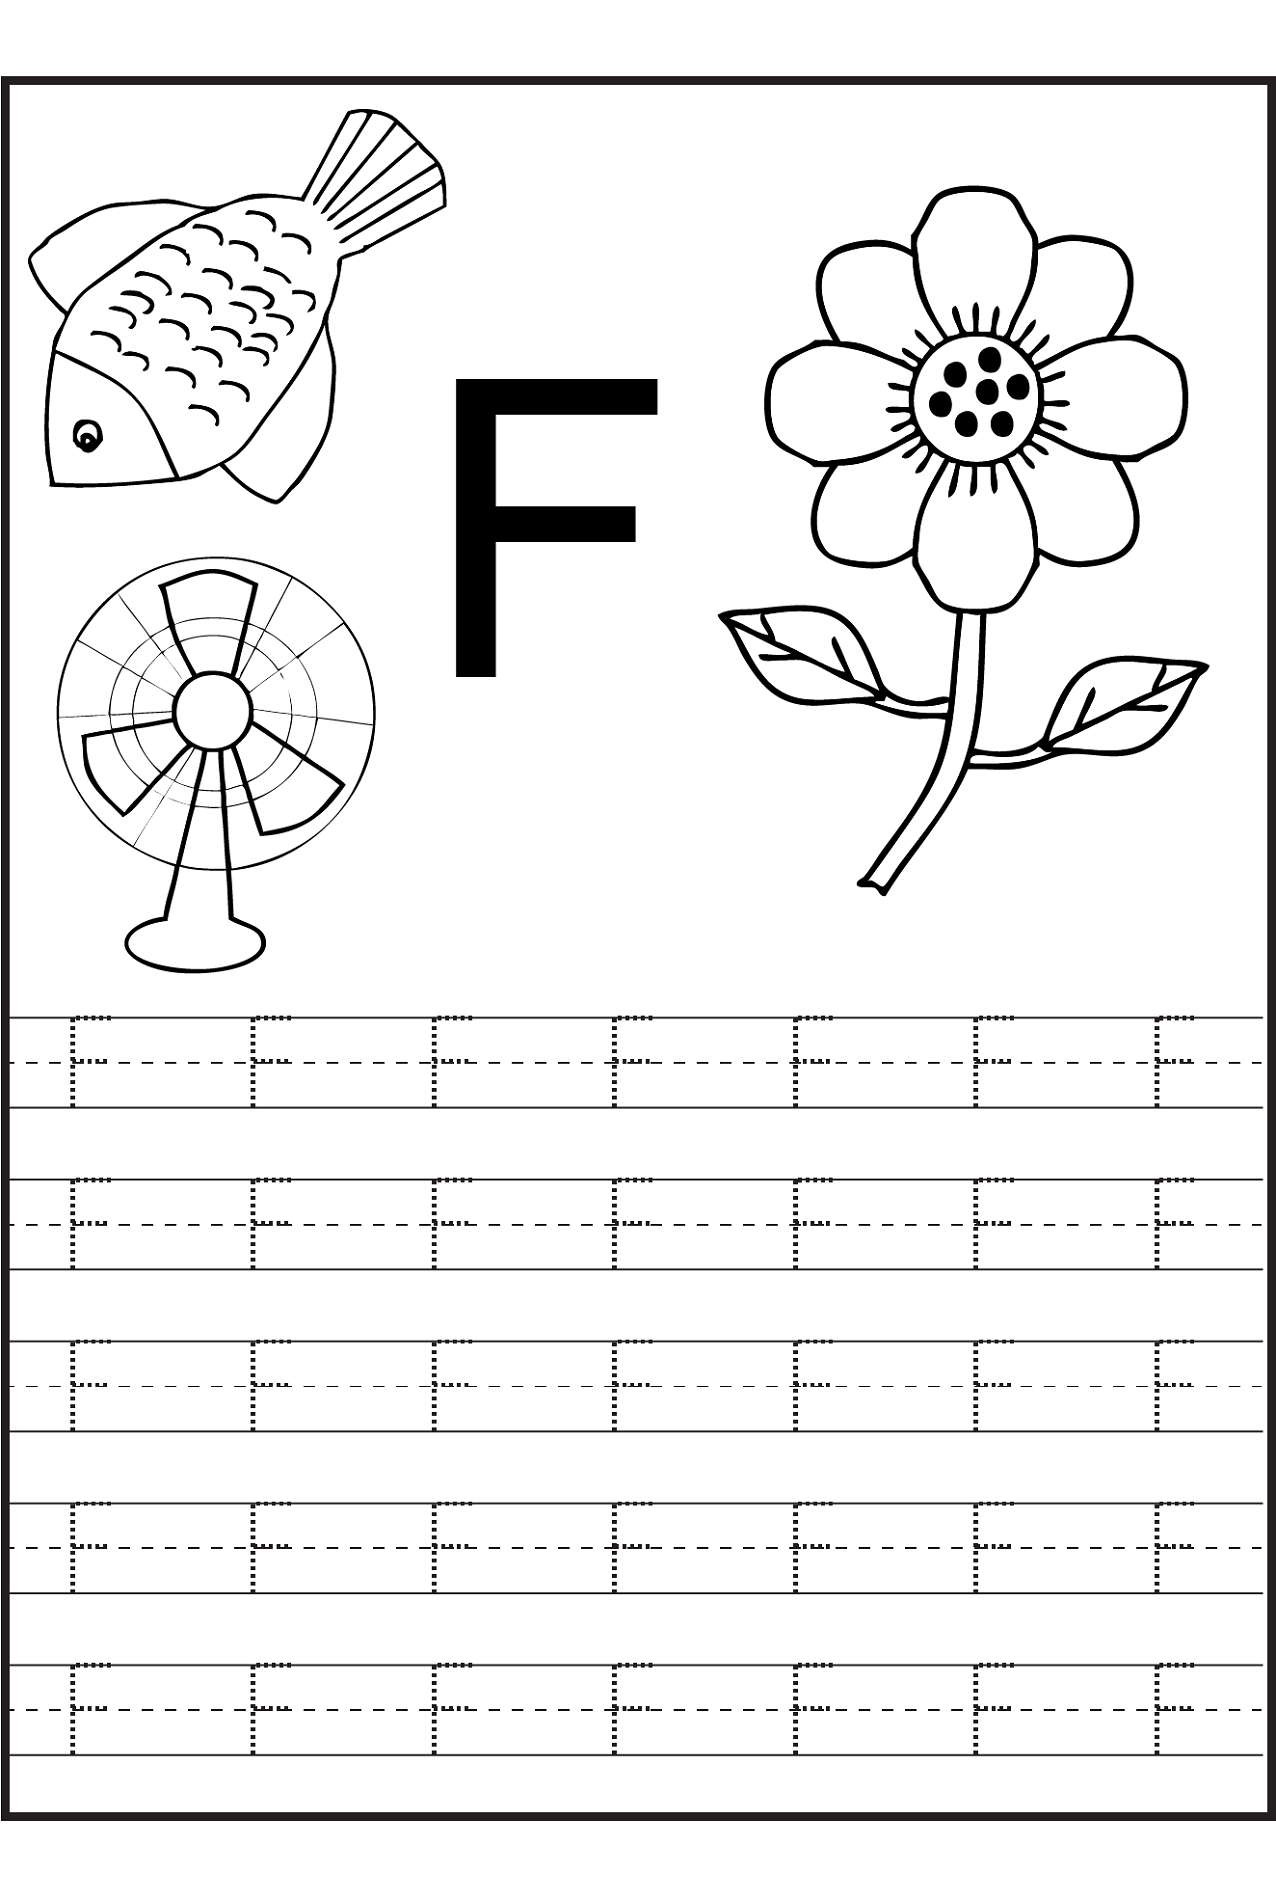 Free Printable Preschool Worksheets For Download